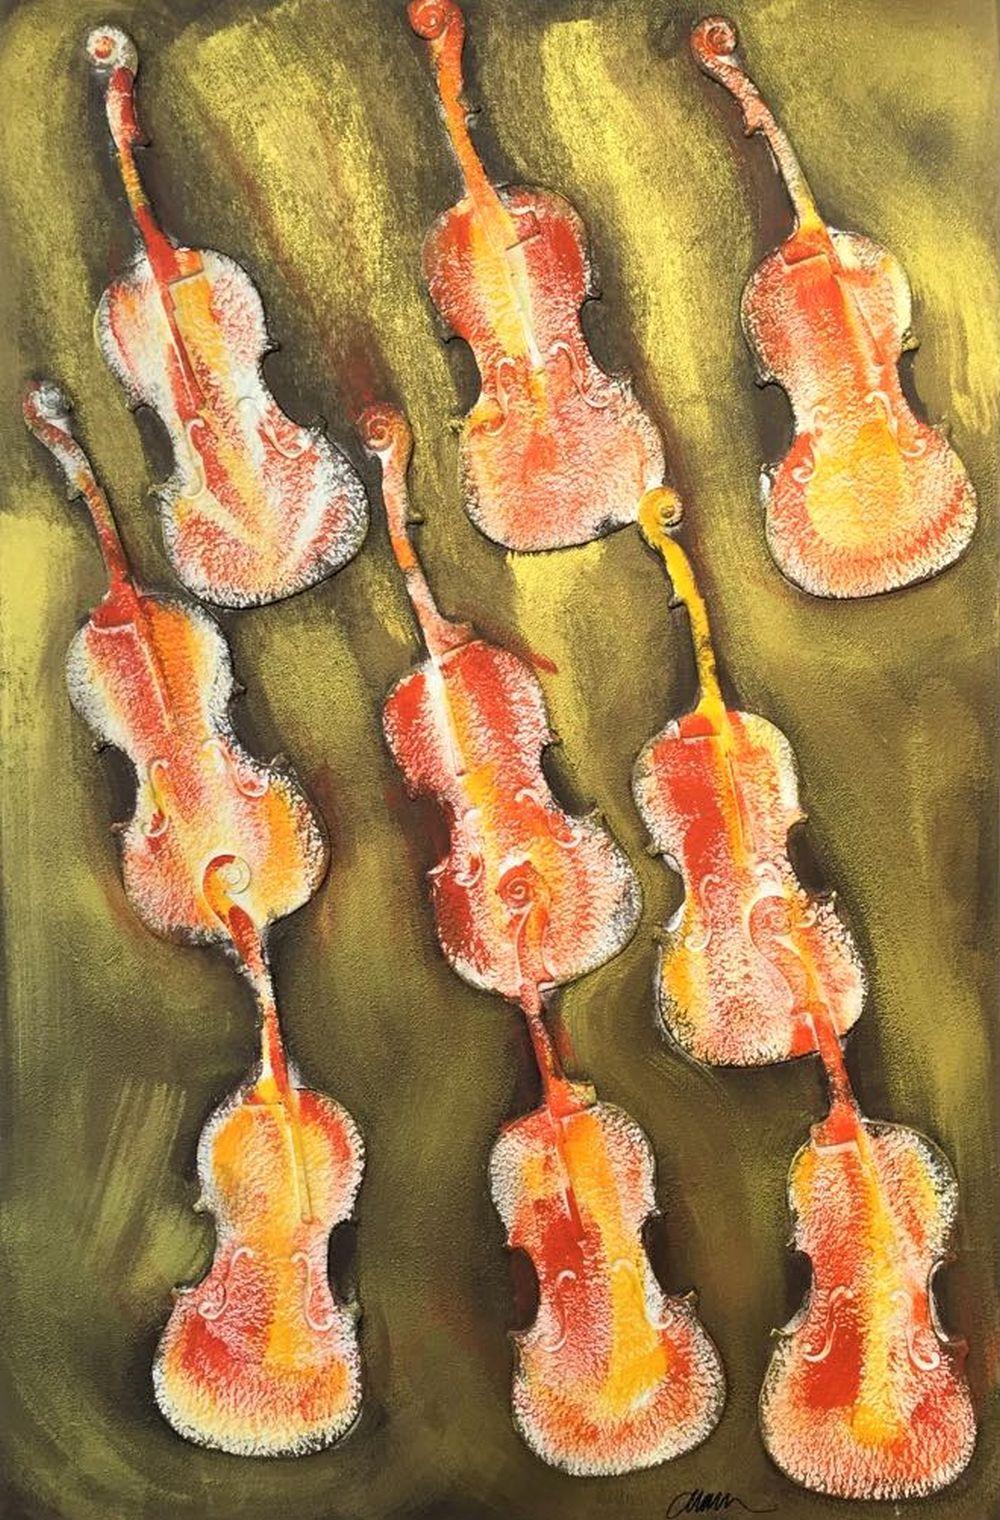 Arman - Empreintes de violon orange, 2004